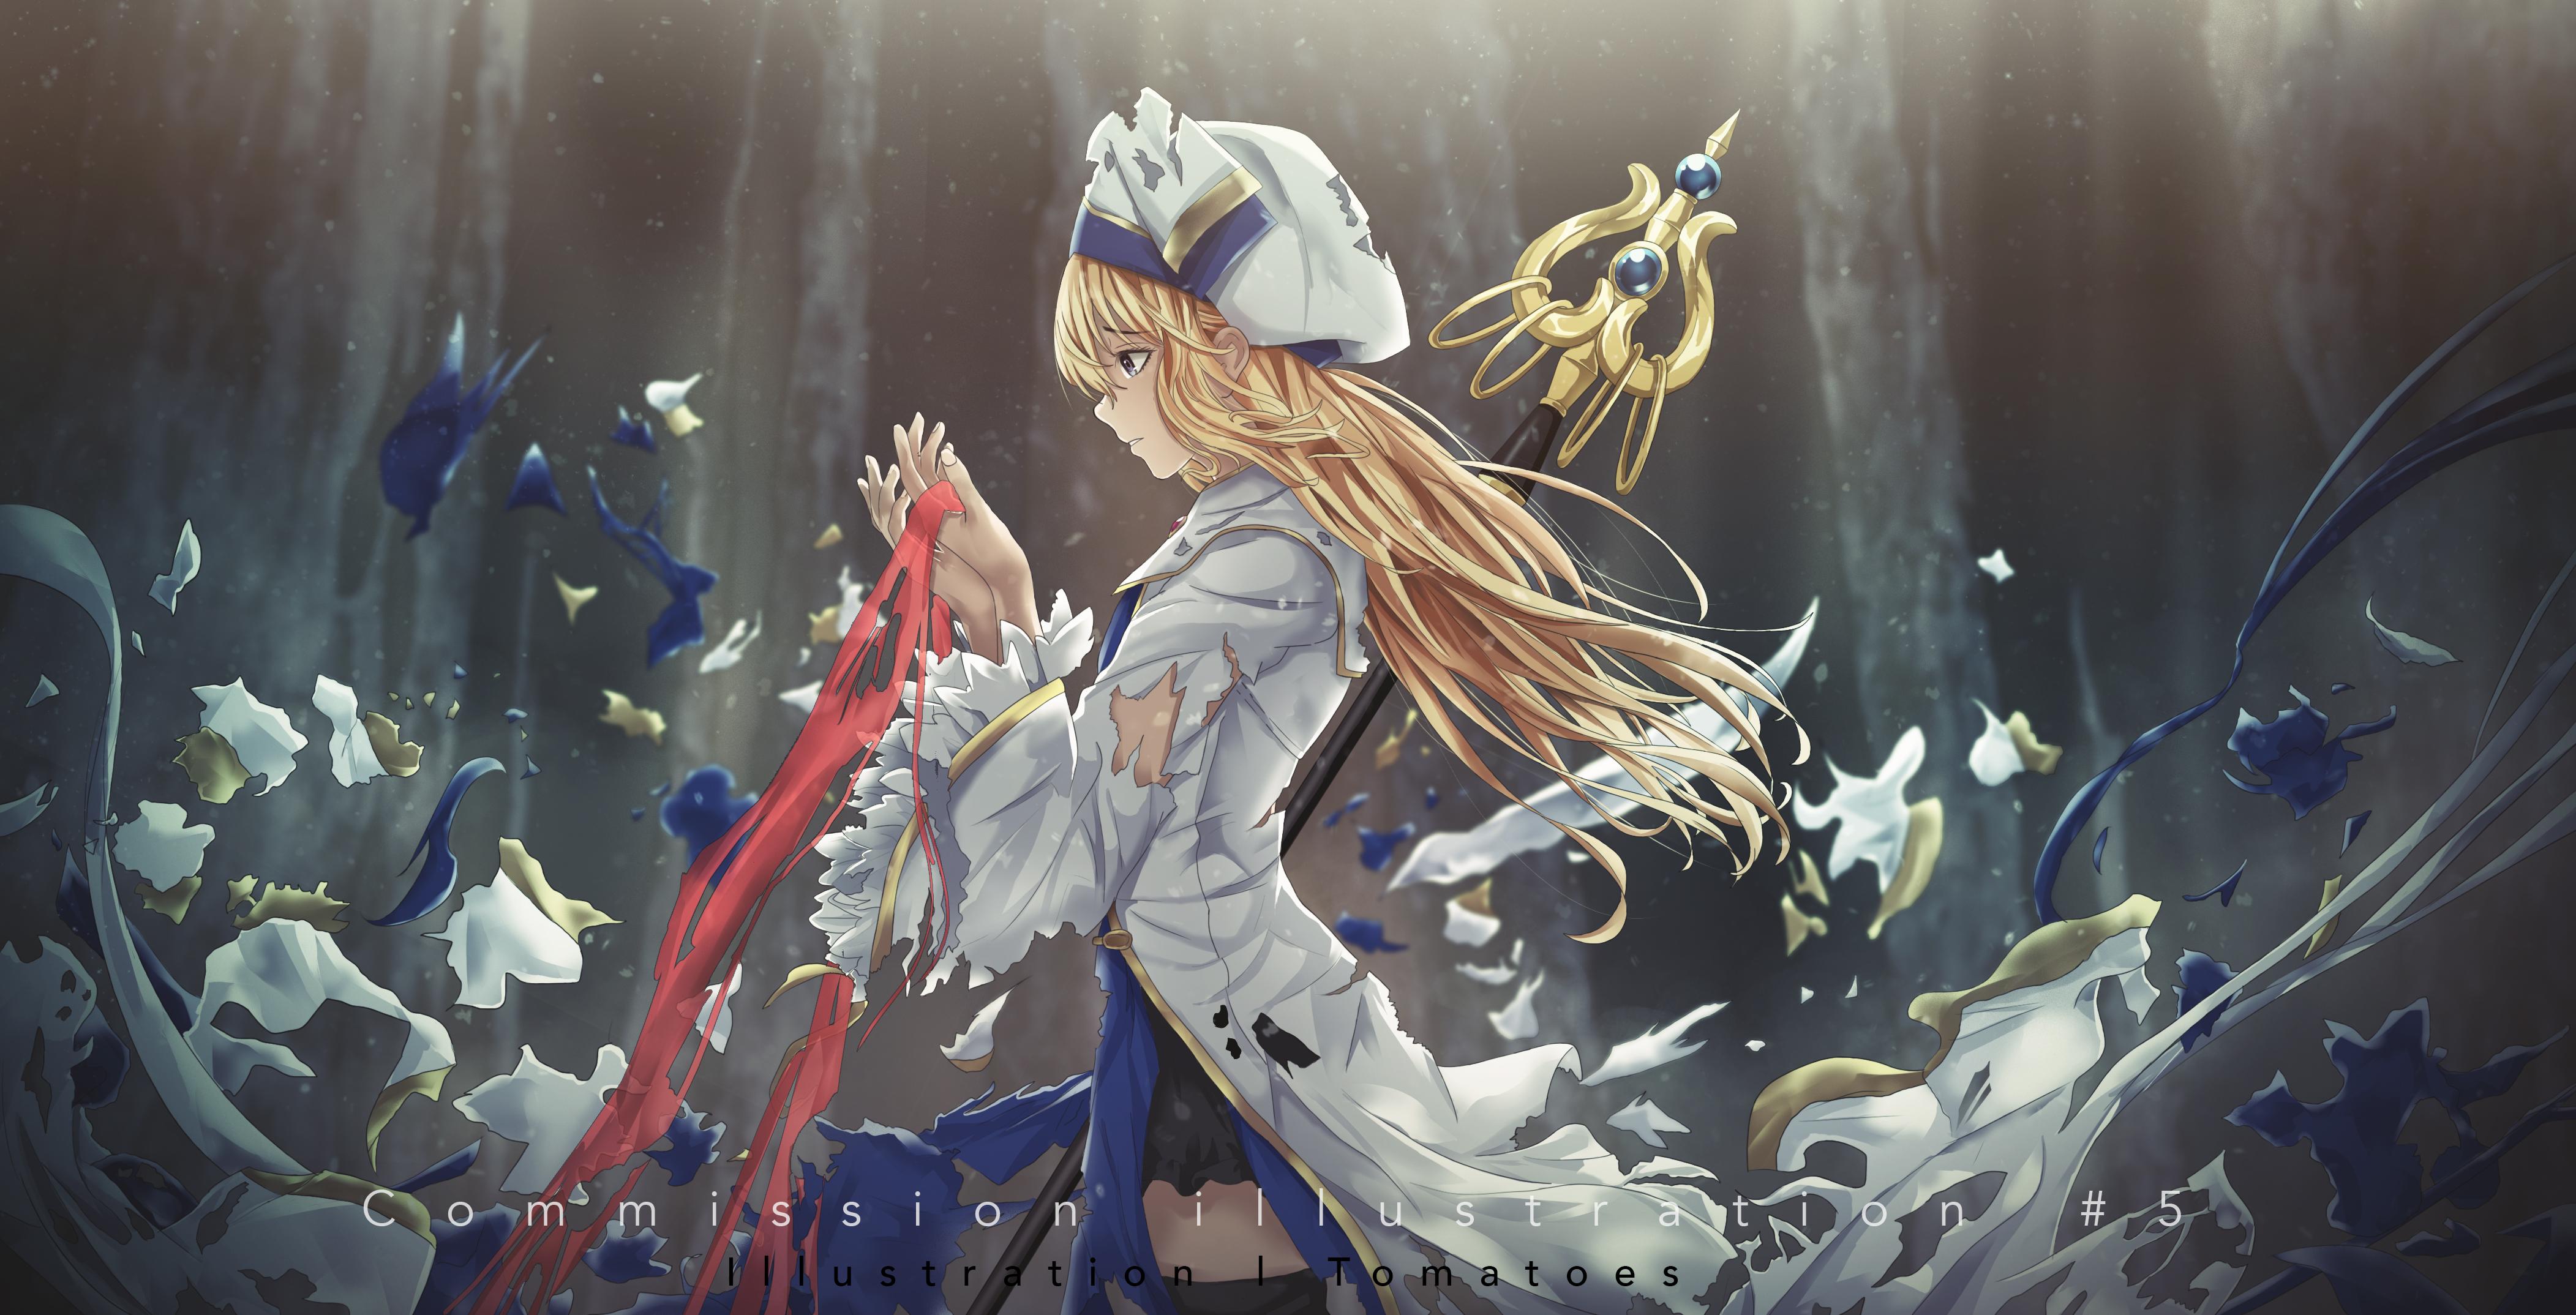 Priestess Goblin Slayer Zerochan Anime Image Board